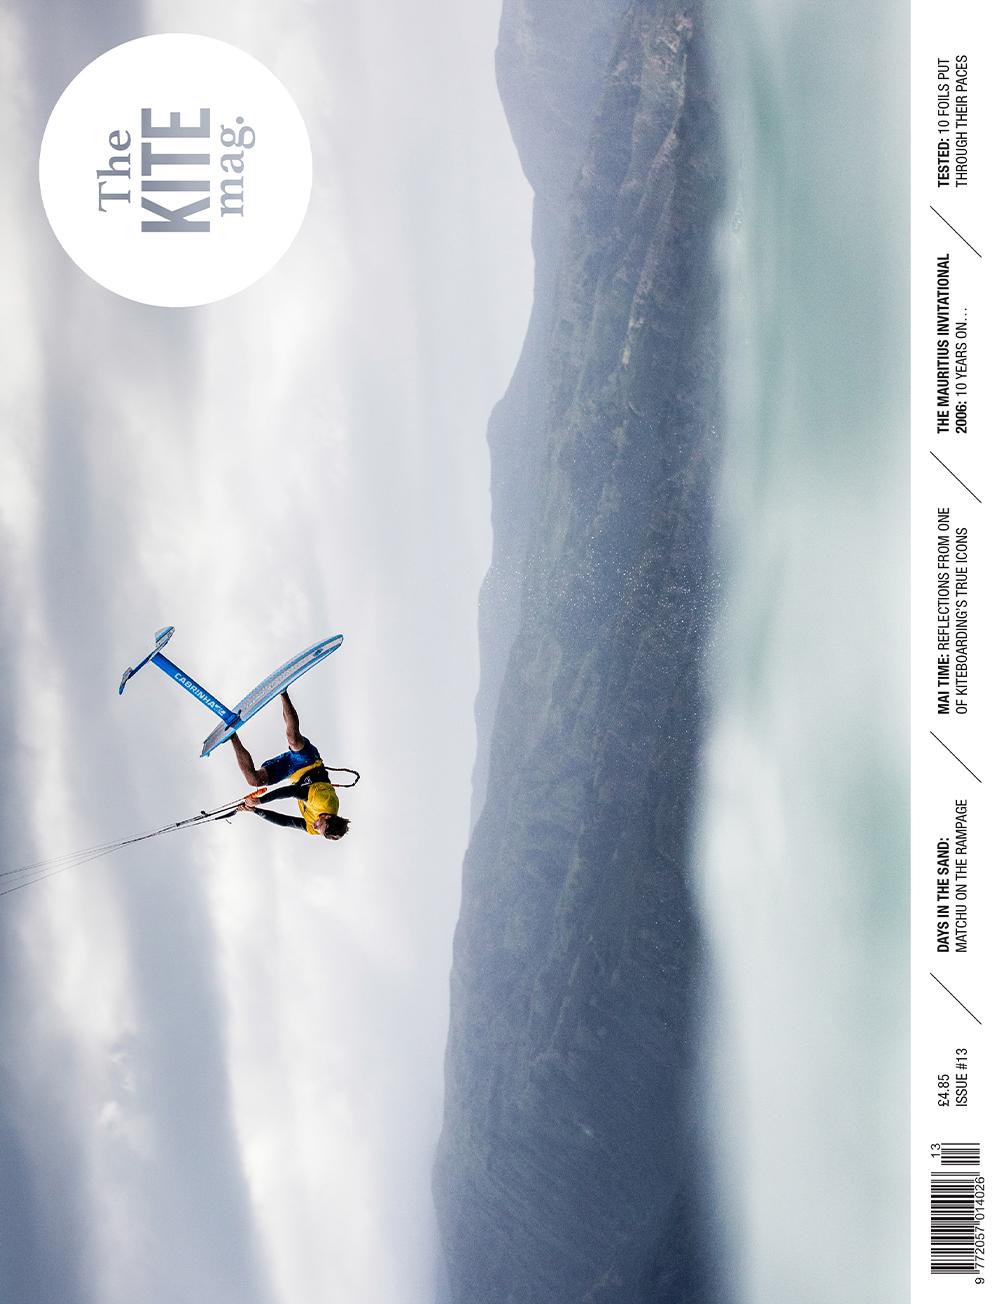 thekitemag cover issue 13 - TheKiteMag issue #13